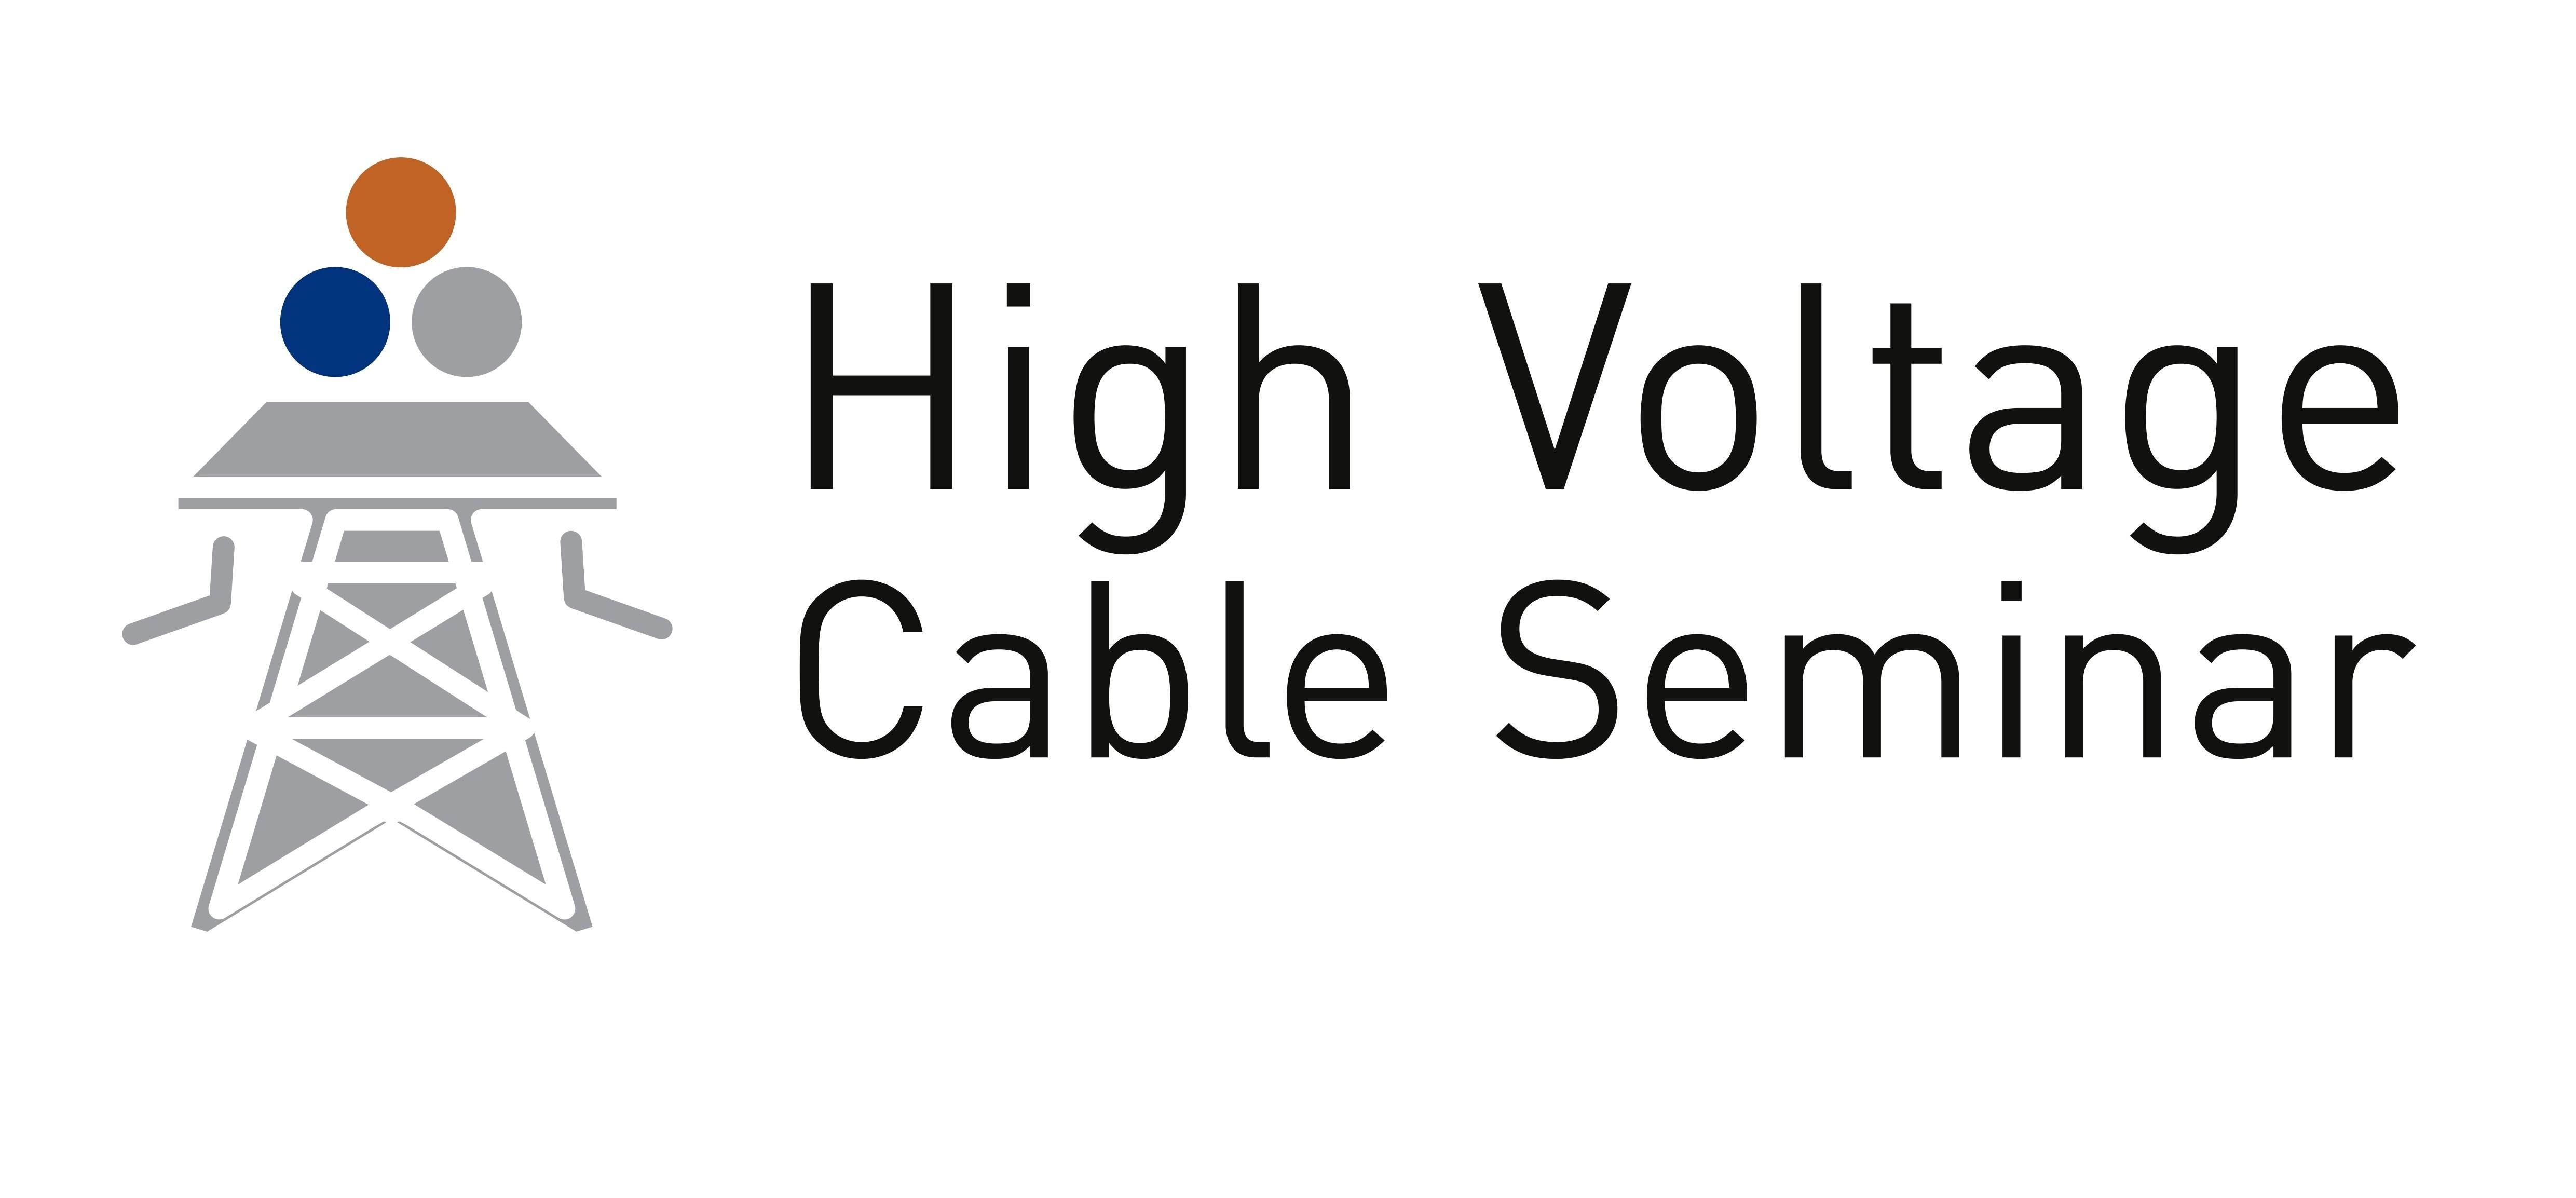 II edycja warsztatów The High Voltage Cable Seminar